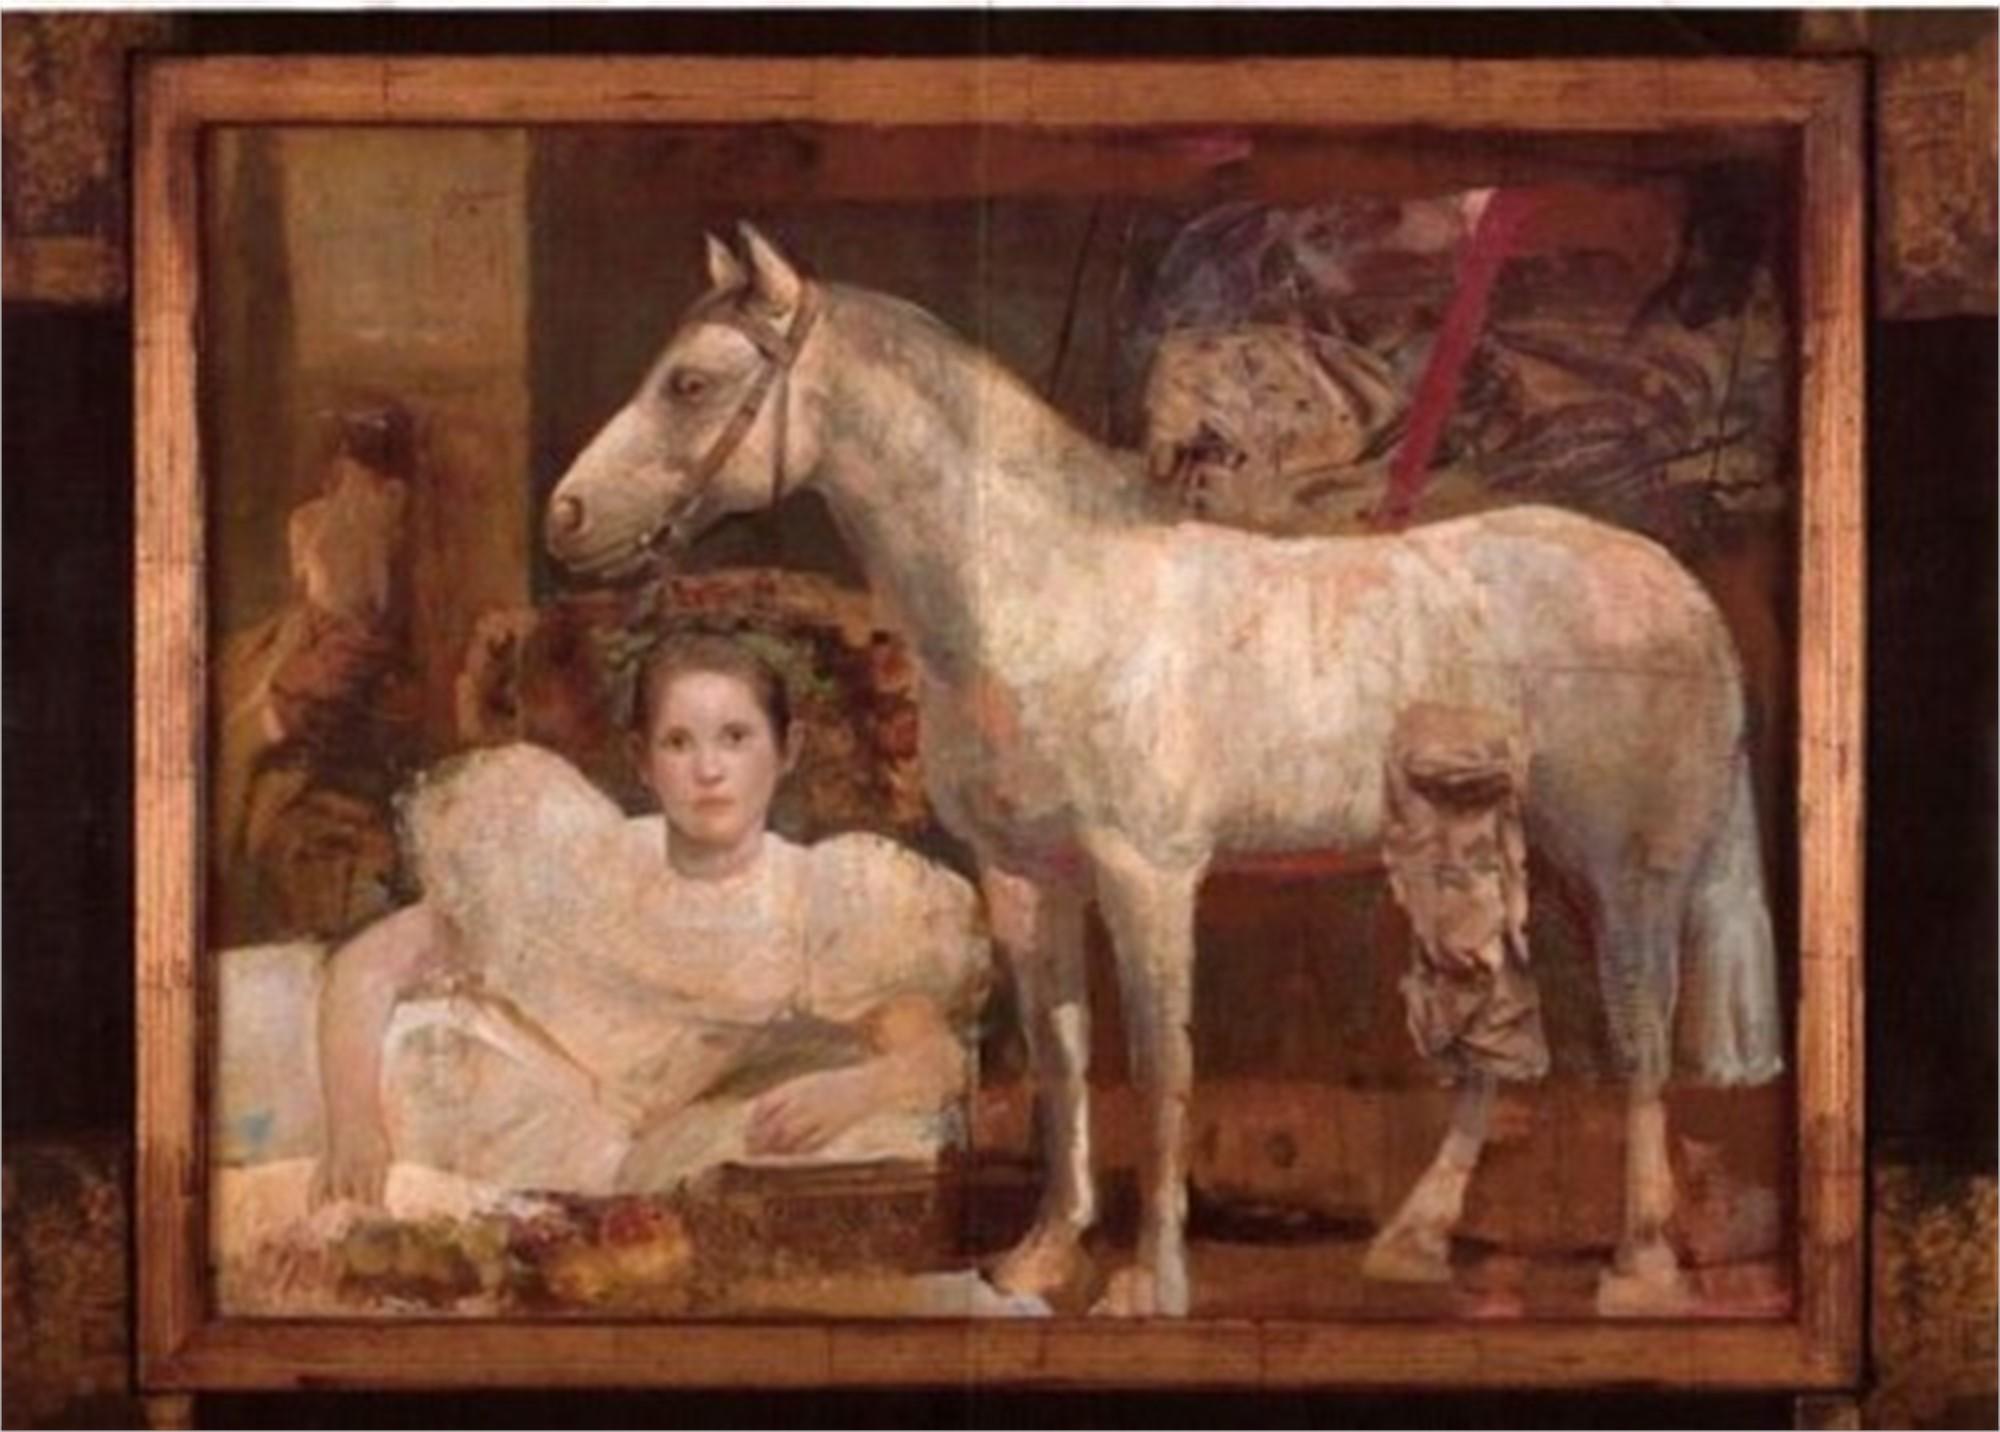 WHITE HORSE by BERBER